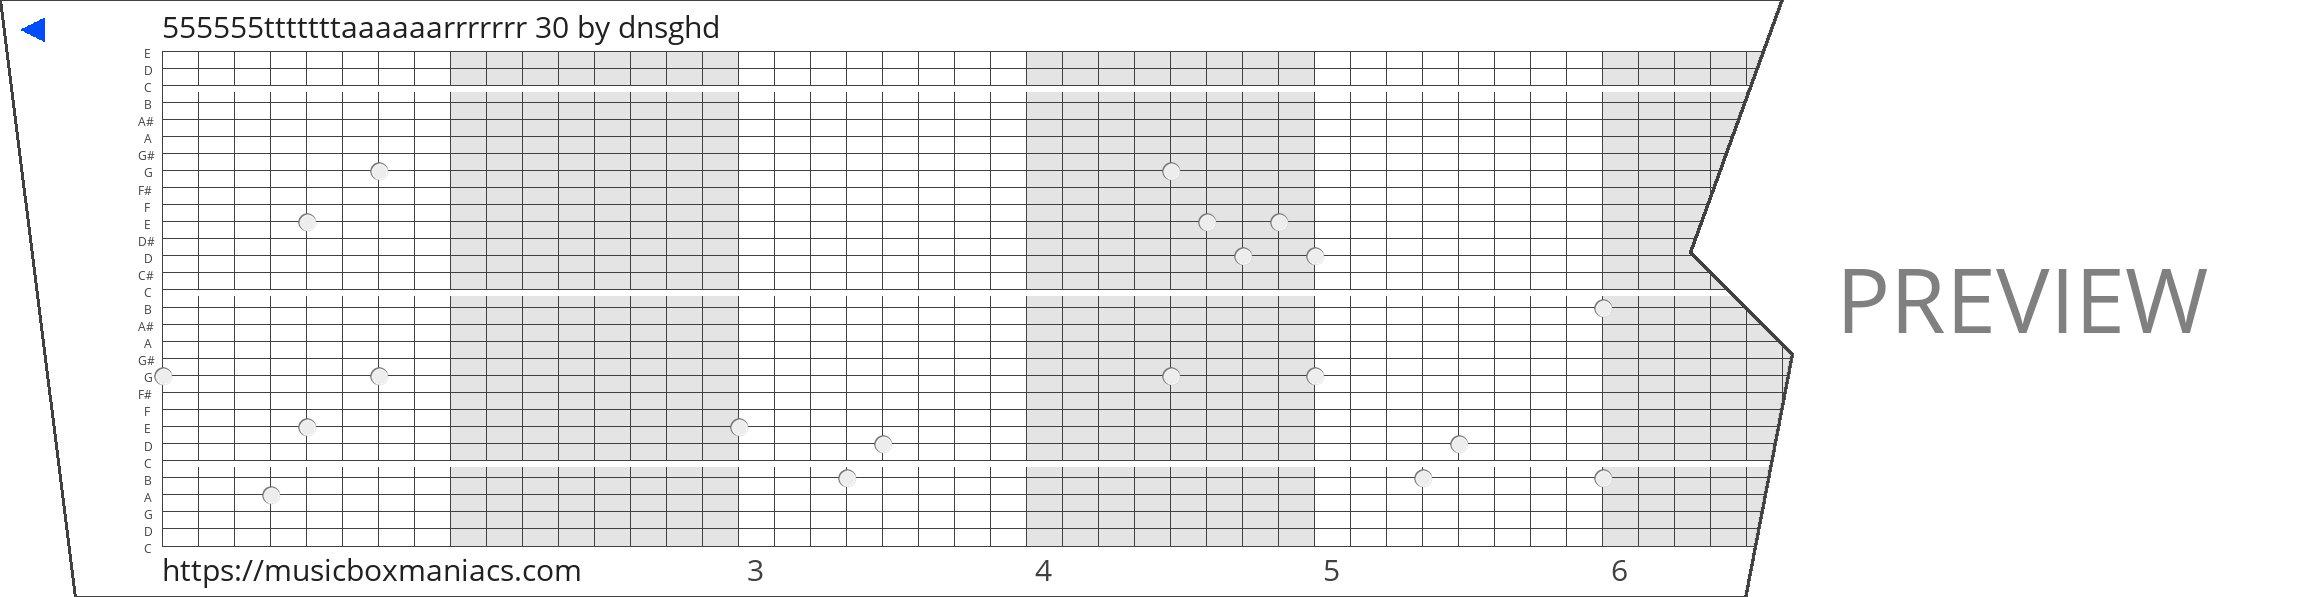 555555tttttttaaaaaarrrrrrr 30 30 note music box paper strip